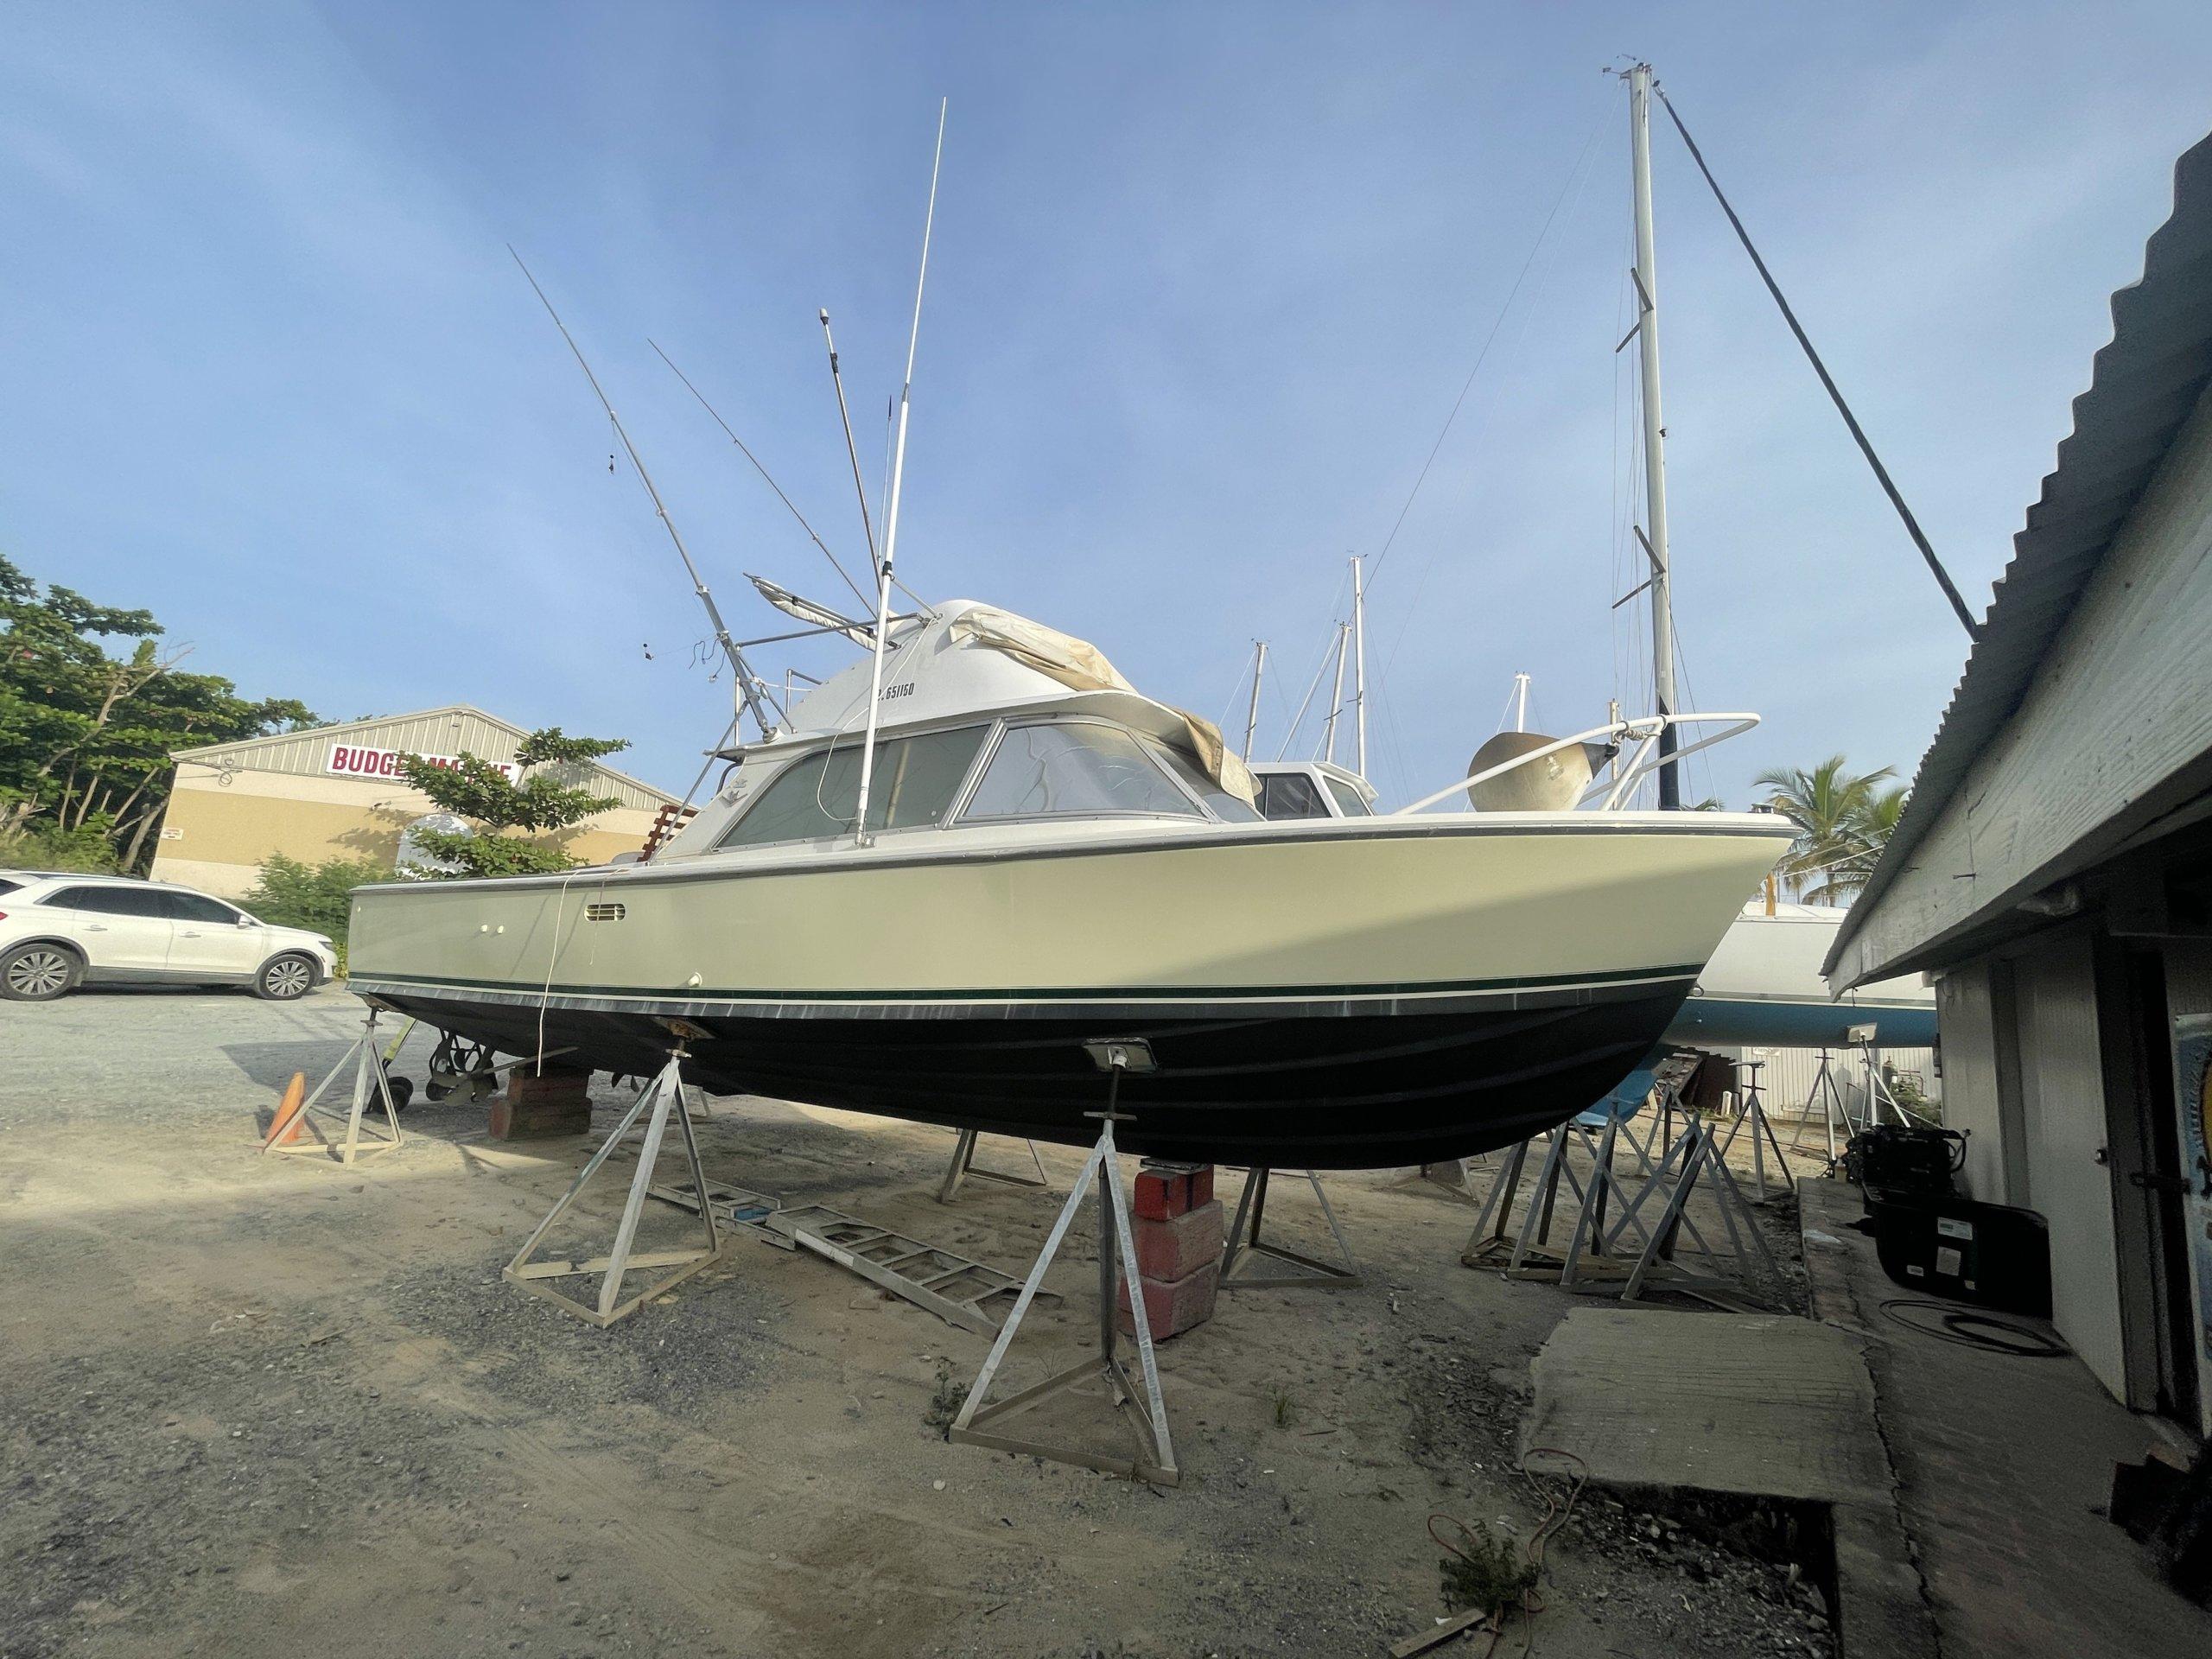 1973 Bertram 31 boats for sale